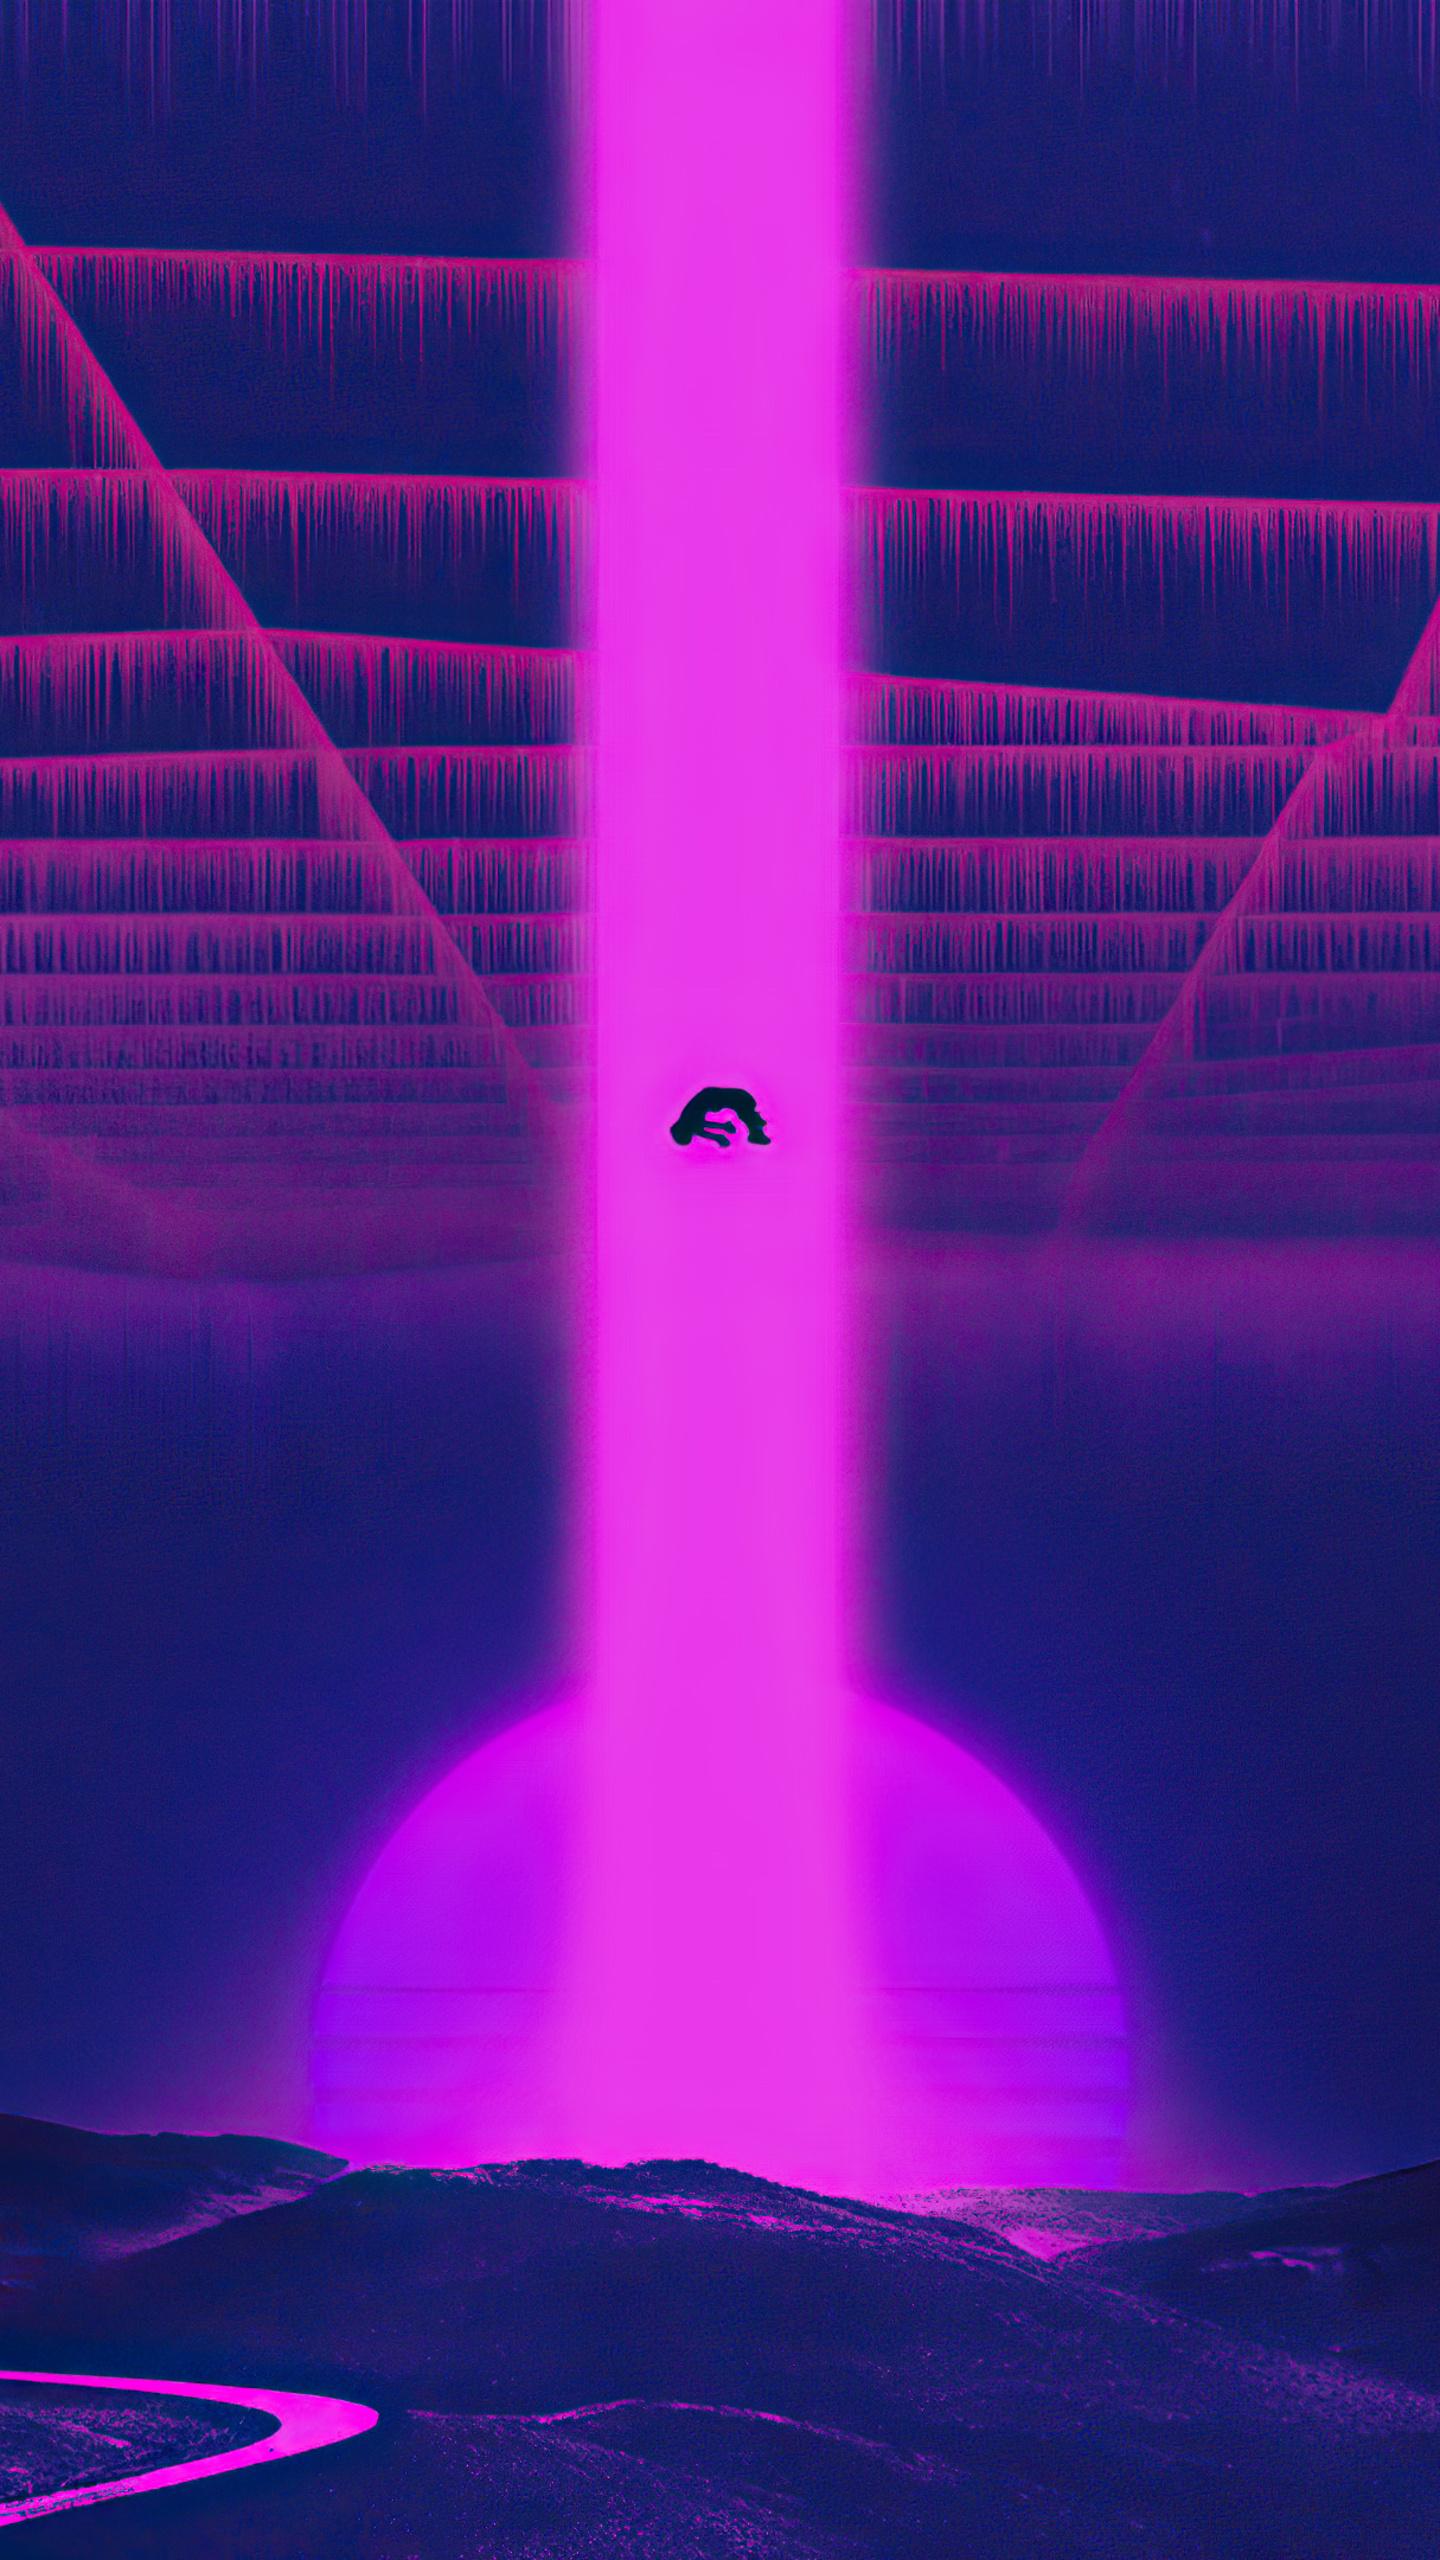 vaporwave-falling-down-4k-77.jpg